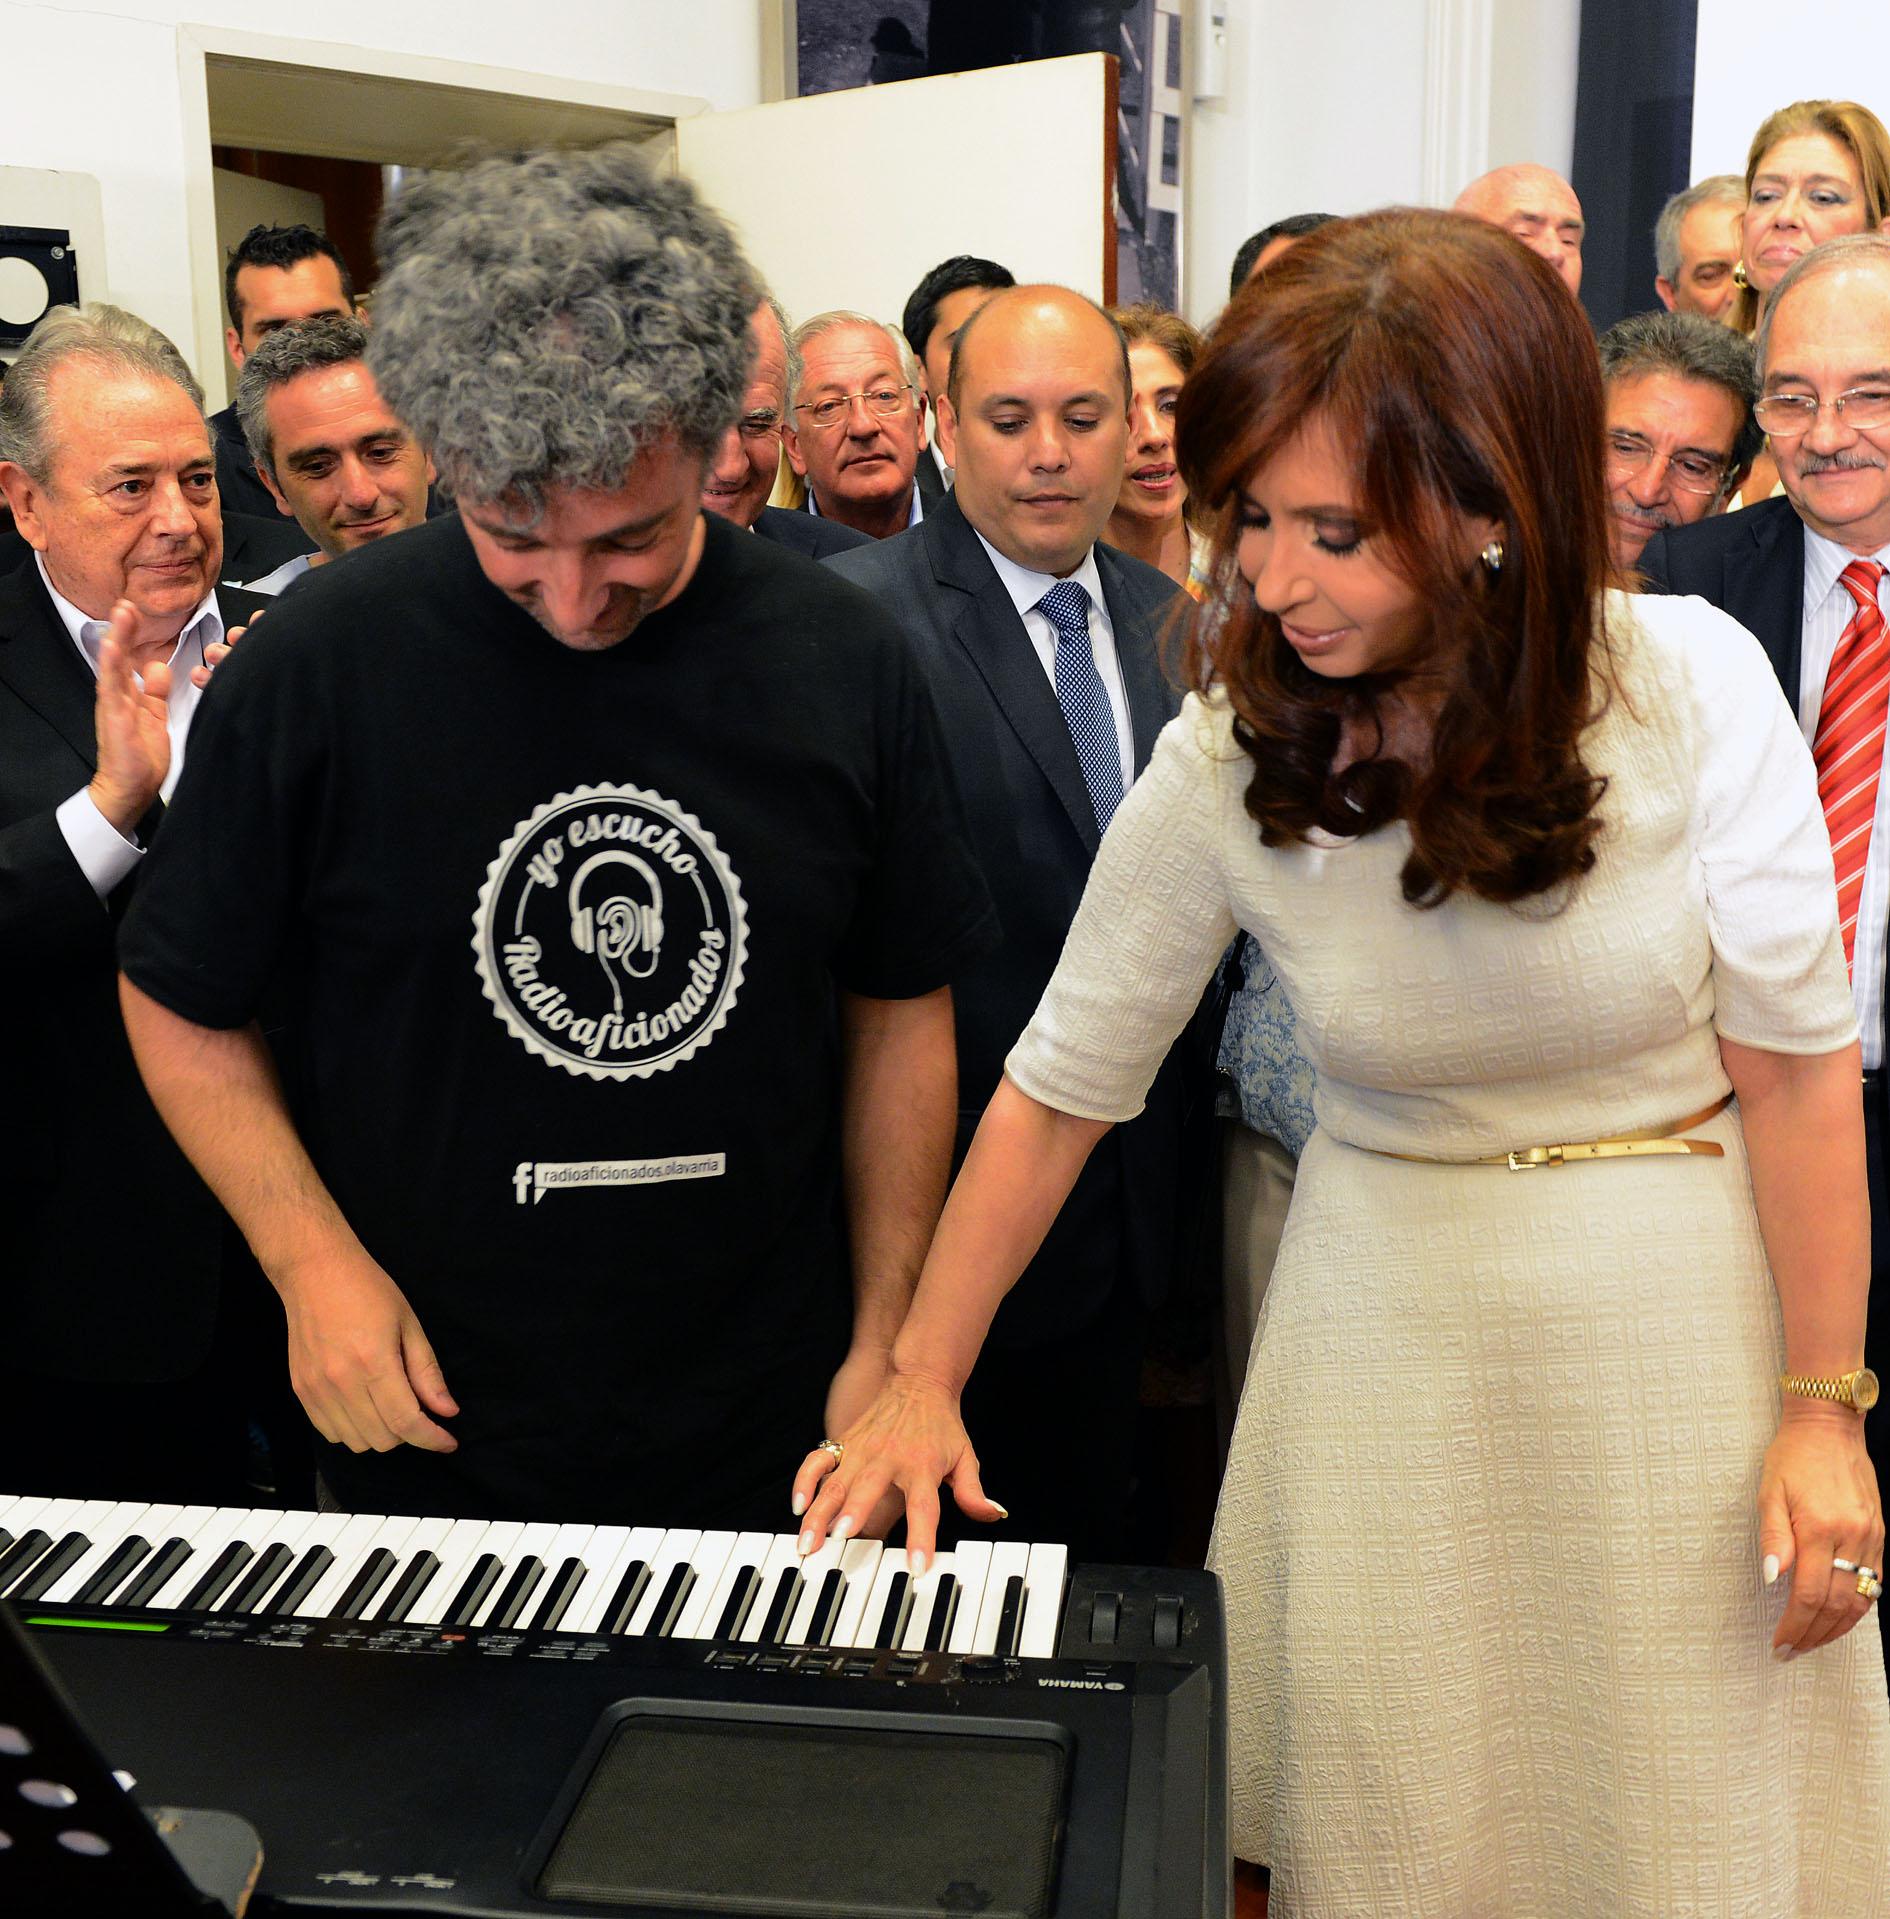 Cristina_democracia2014_Plaza_CASAROSADA_03